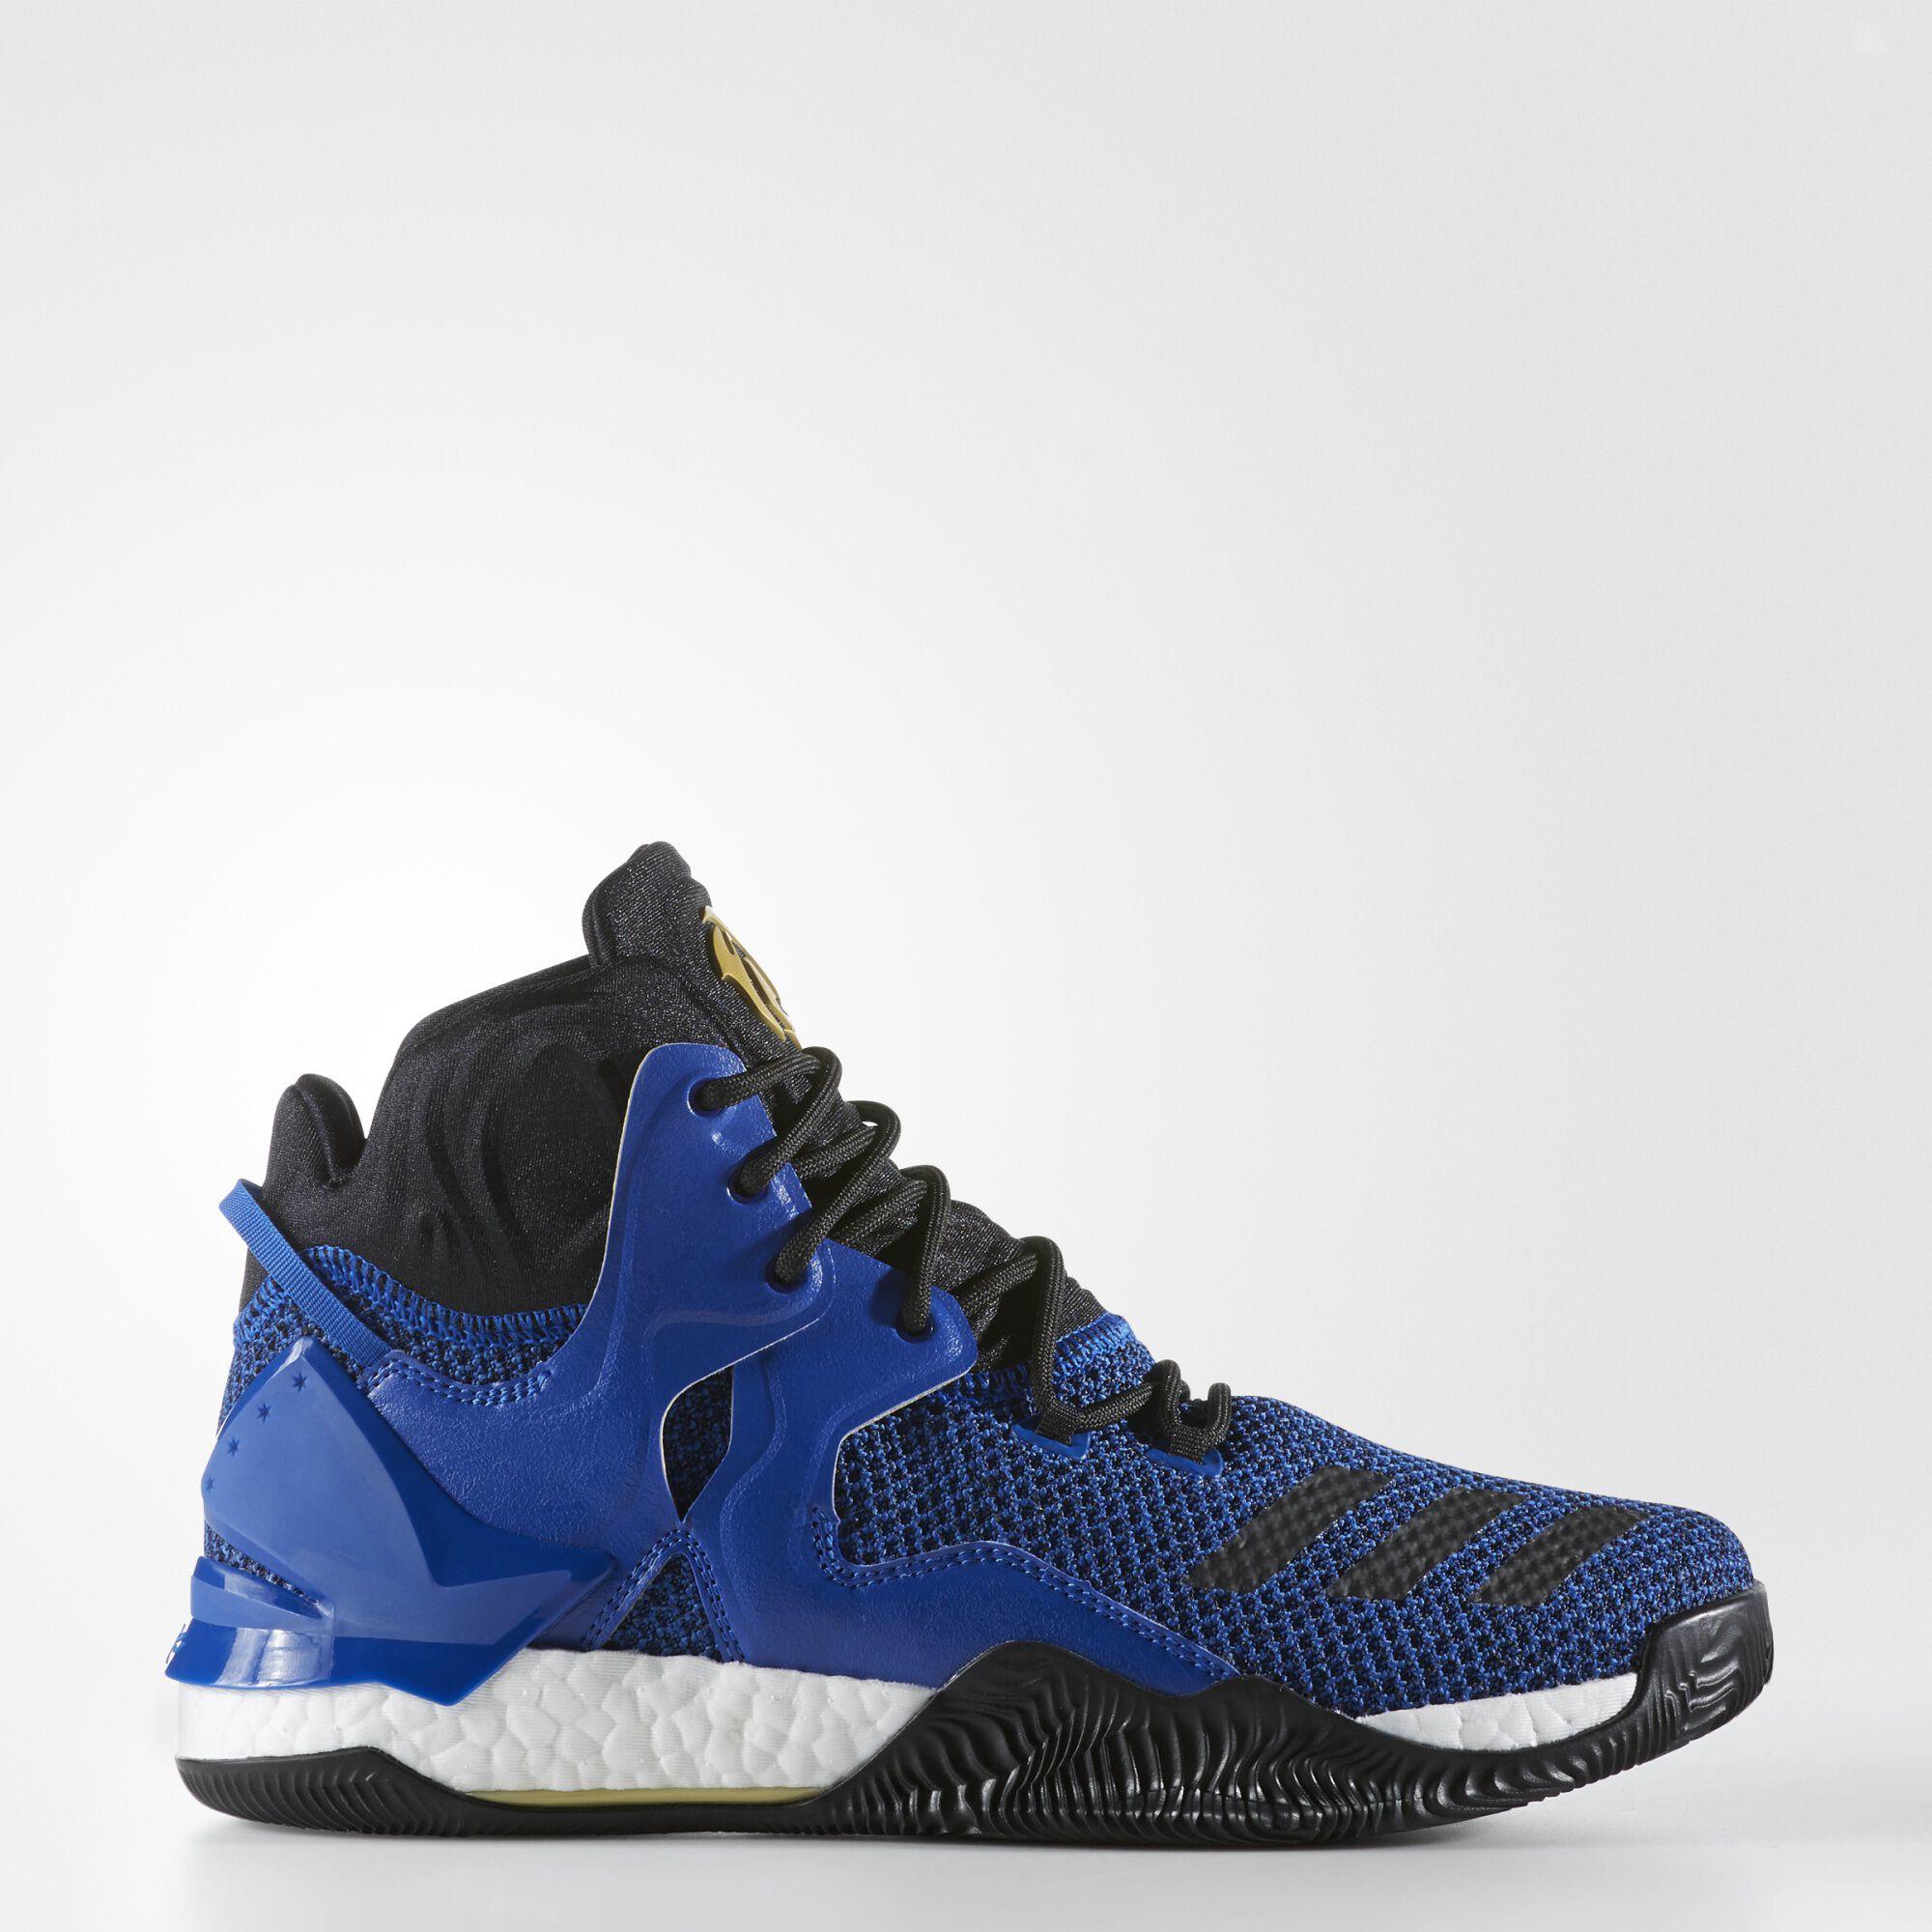 adidas - D Rose 7 Shoes Blue Solid / Black / Metallic Gold BB8290